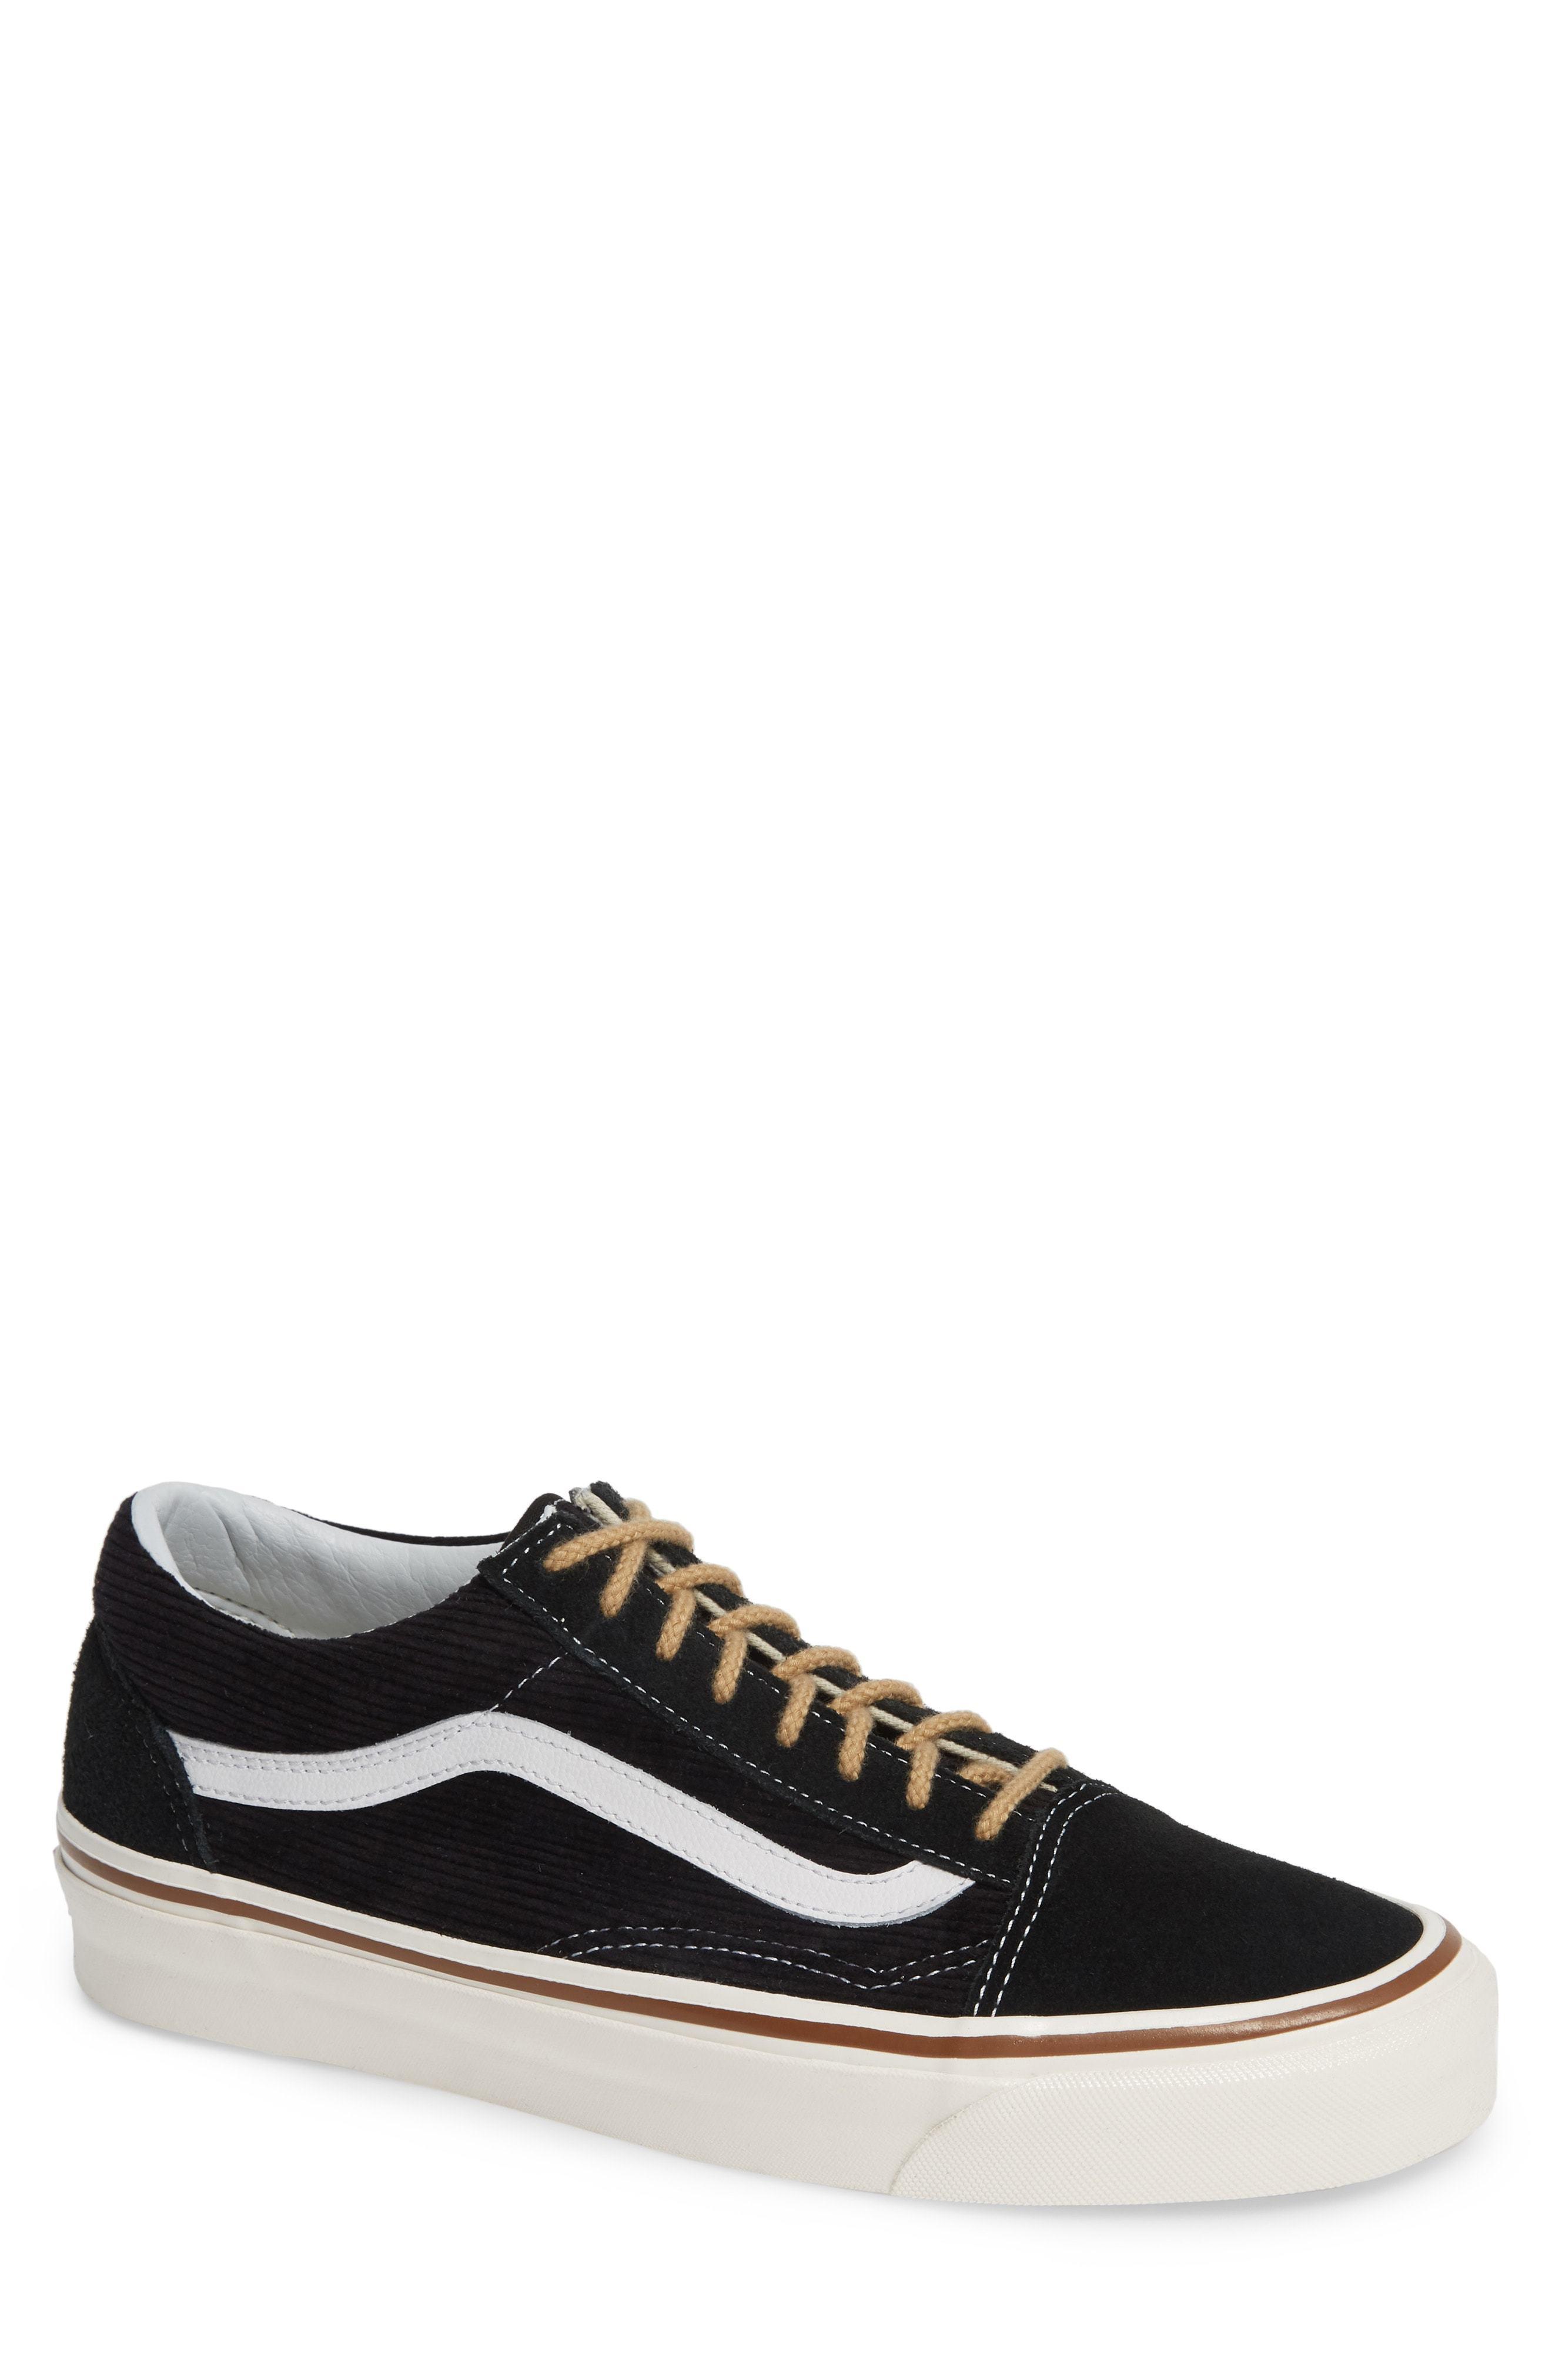 8fcf149e3c ... Vans Anaheim Factory Old Skool 36 Dx Sneaker